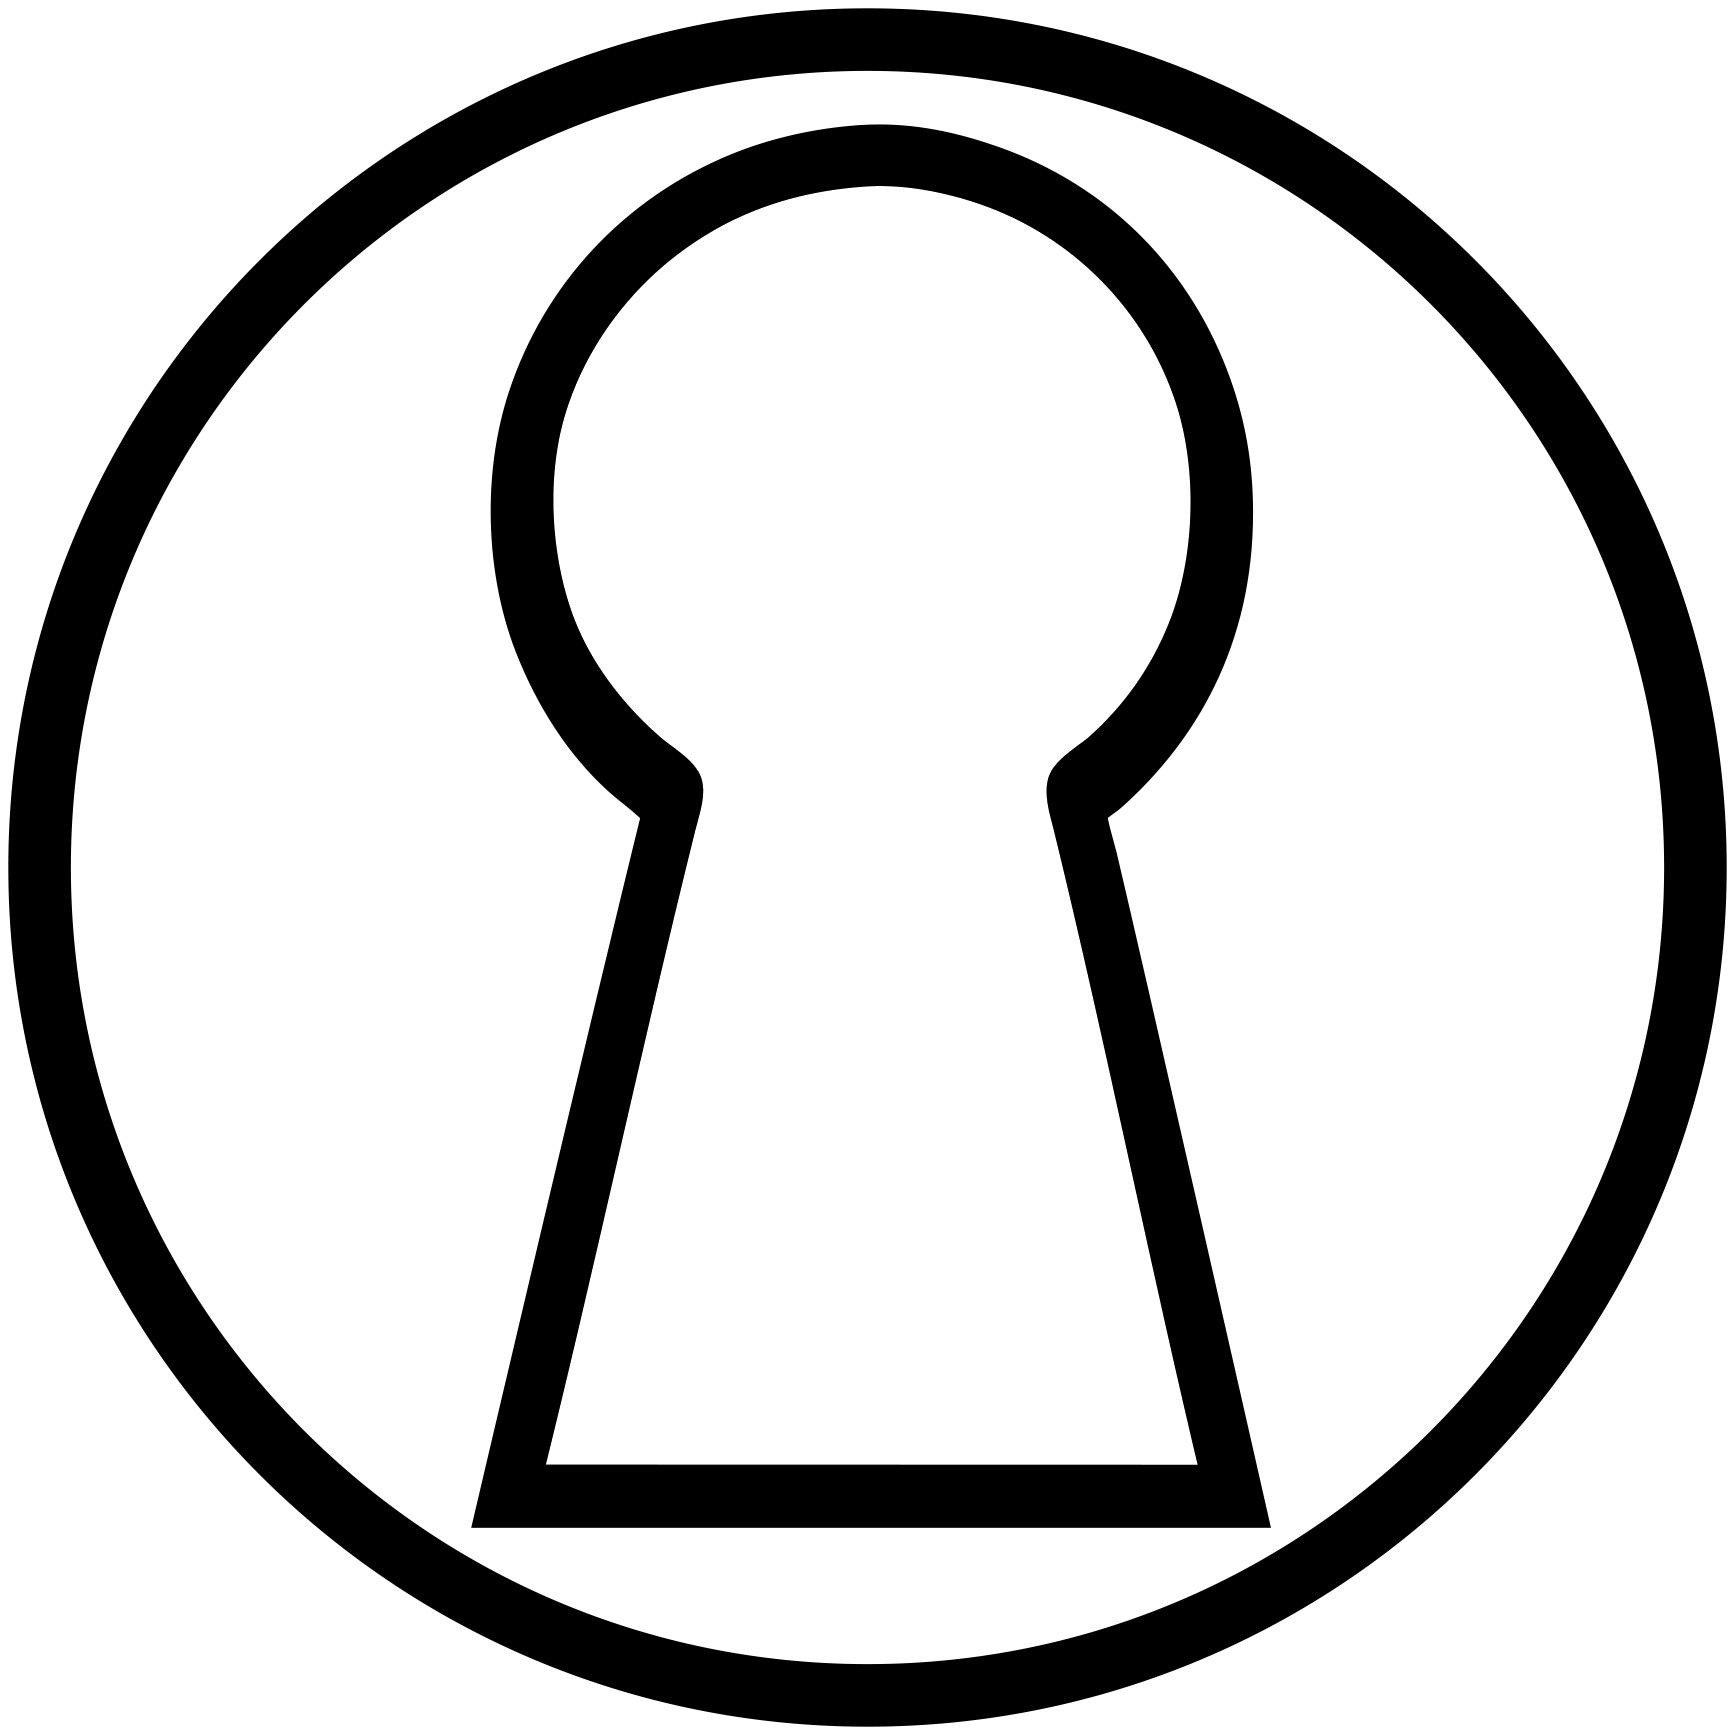 Drawing at getdrawings com. Clipart key keyhole